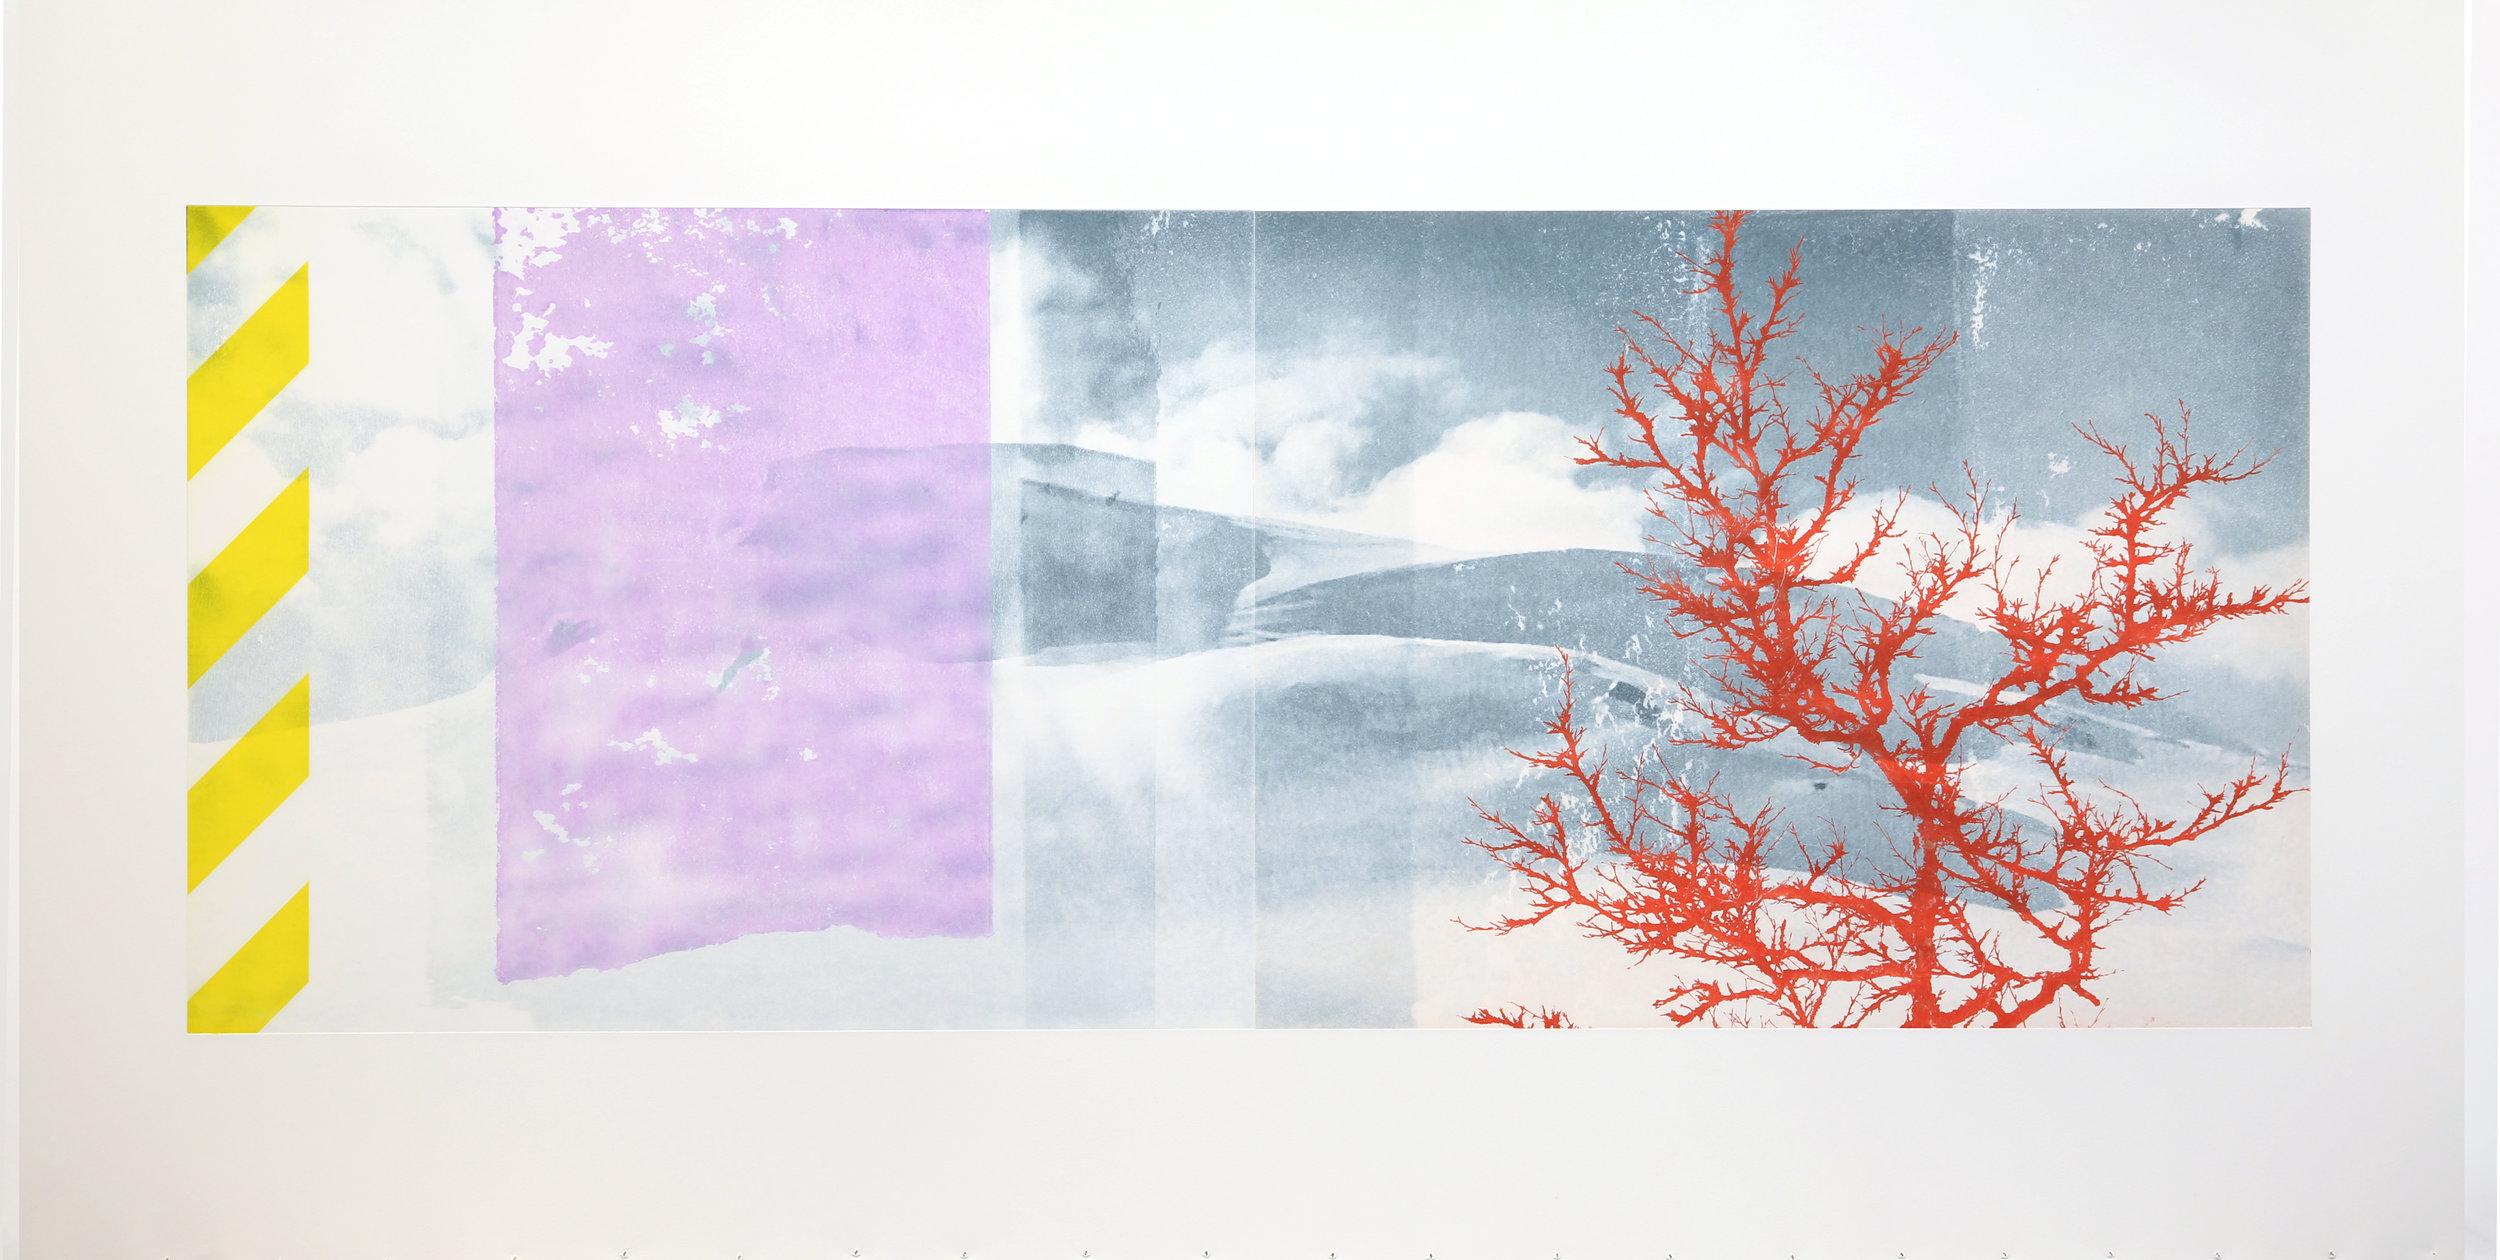 GHOSTPRINT: Reservoir / Birch in storm ( Setesdal )  Polymer / Etching / Drypoint 200 x 90 cm / 78,4 x 35,5 in Edition of 10 + 10 Ap Editeur: Per Fronth / Atelje Ole Larsen / Helsingborg  26/2015: